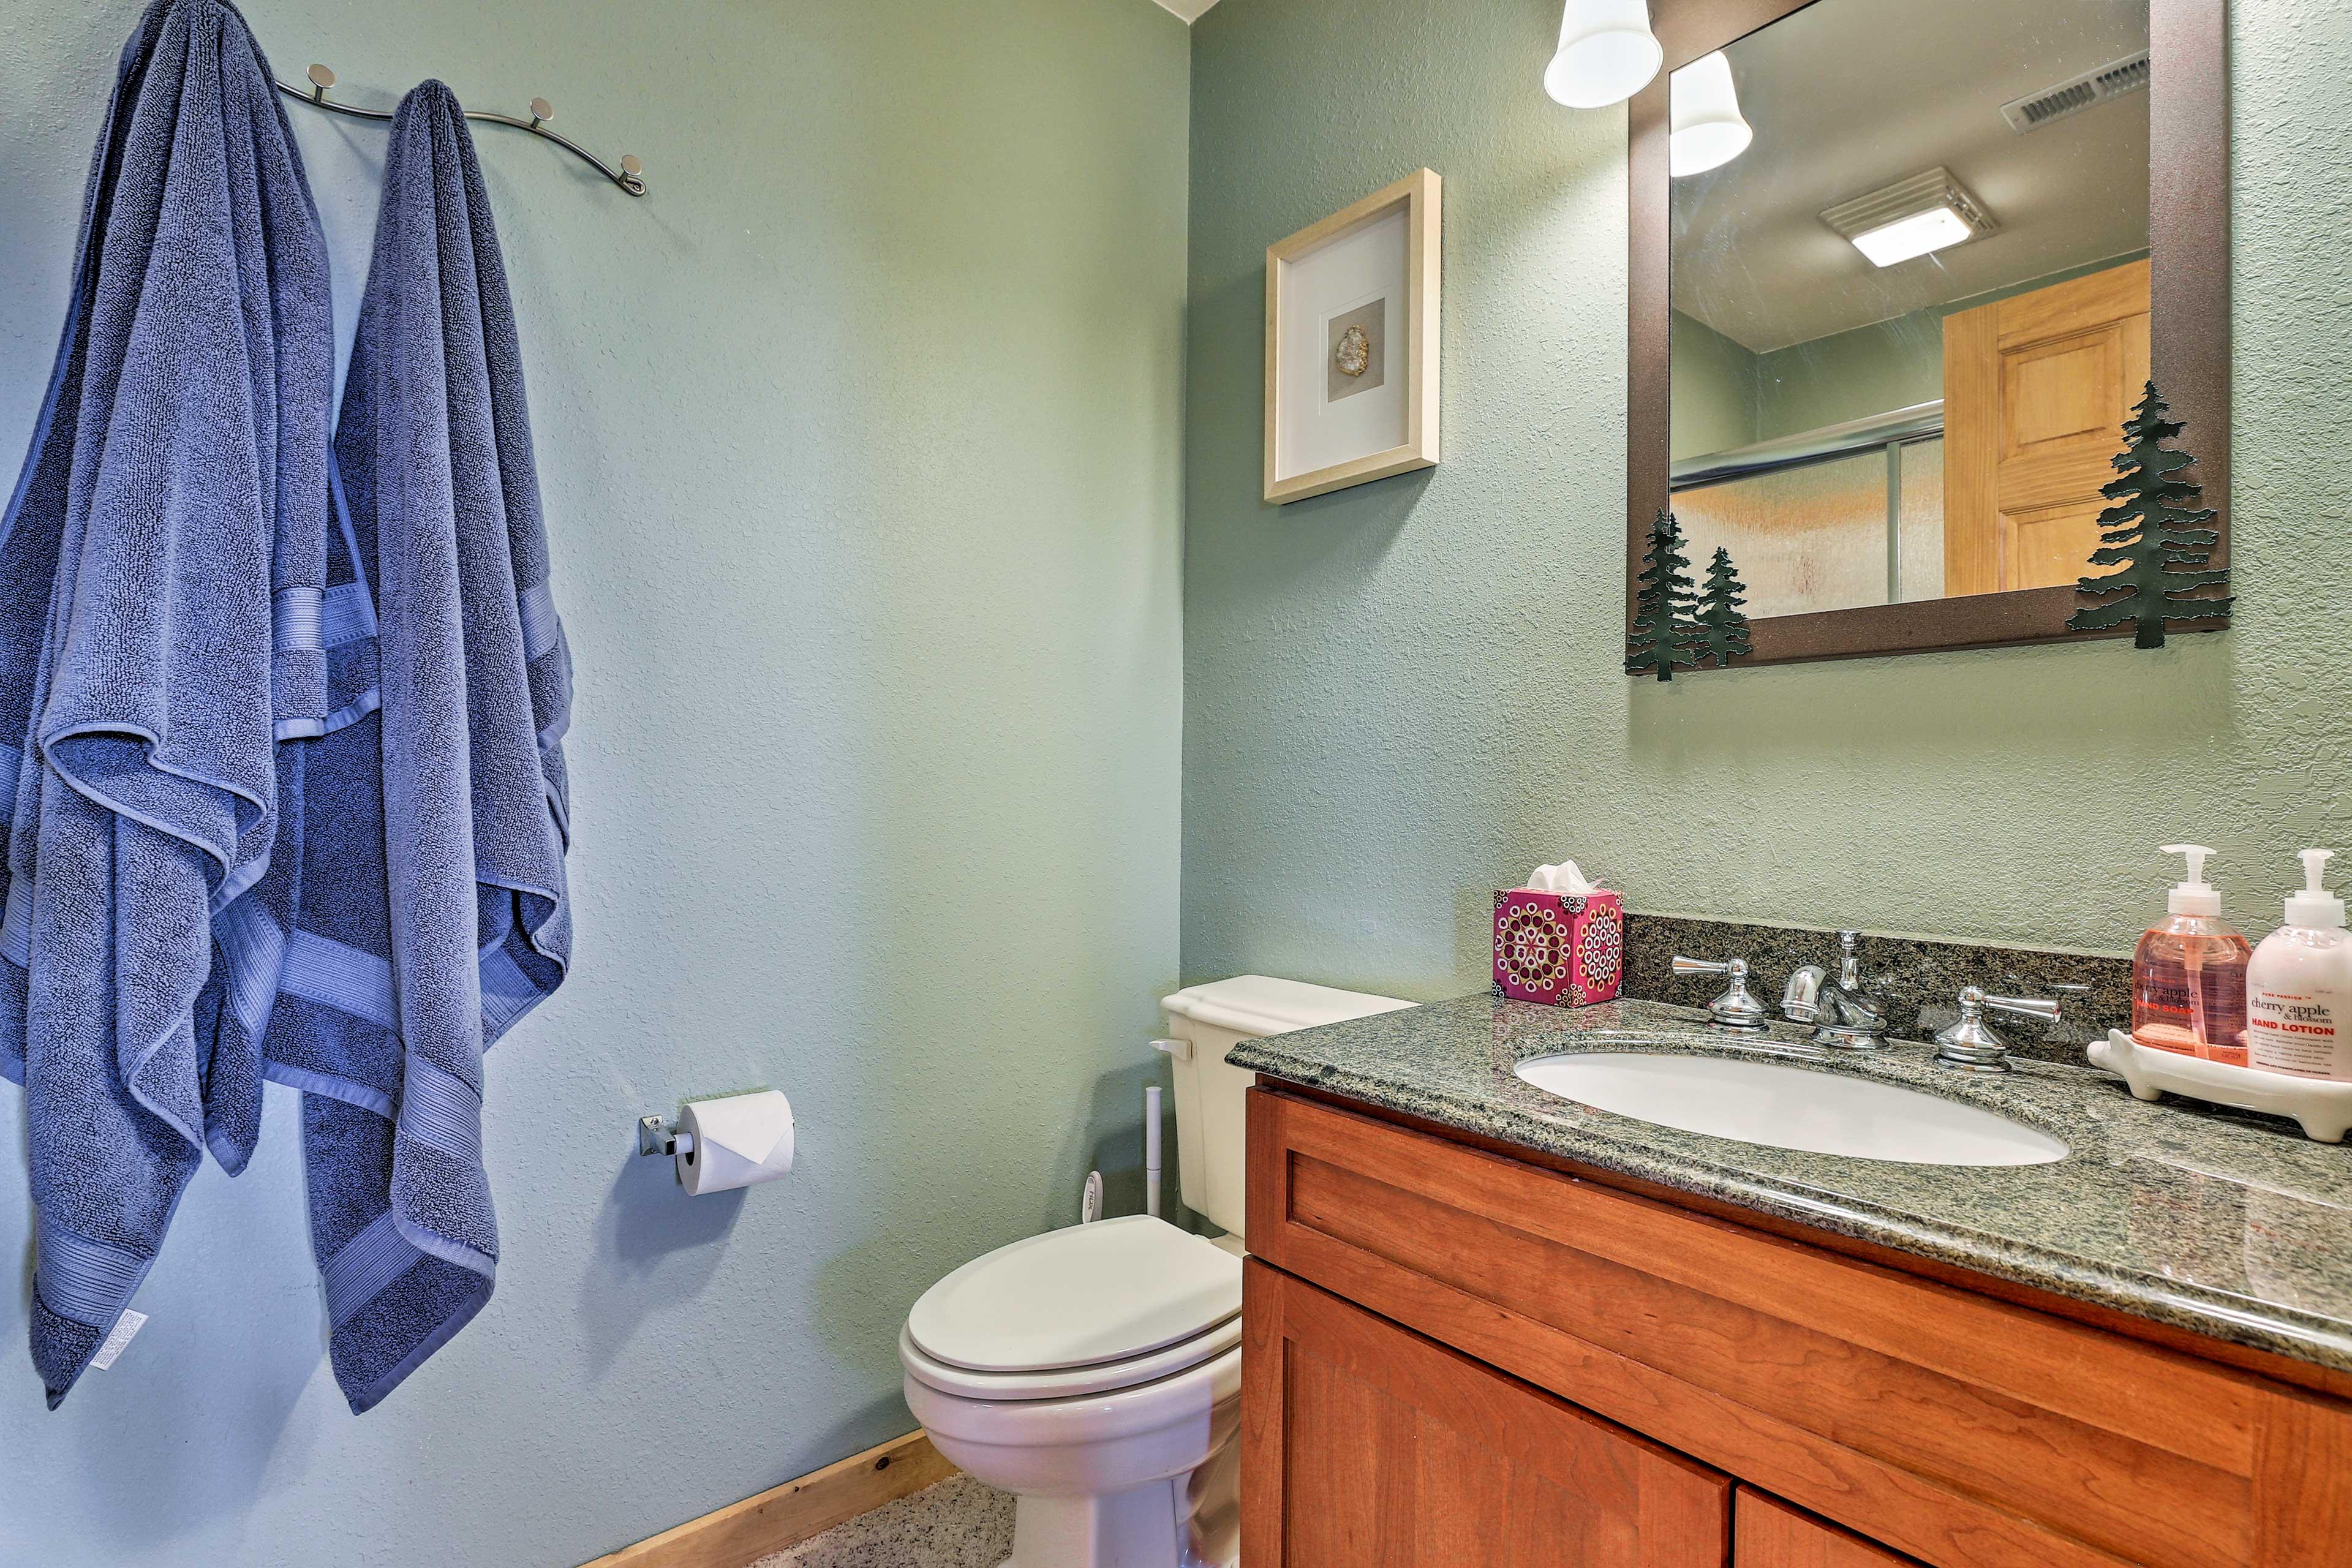 Enjoy fresh linens and towels.